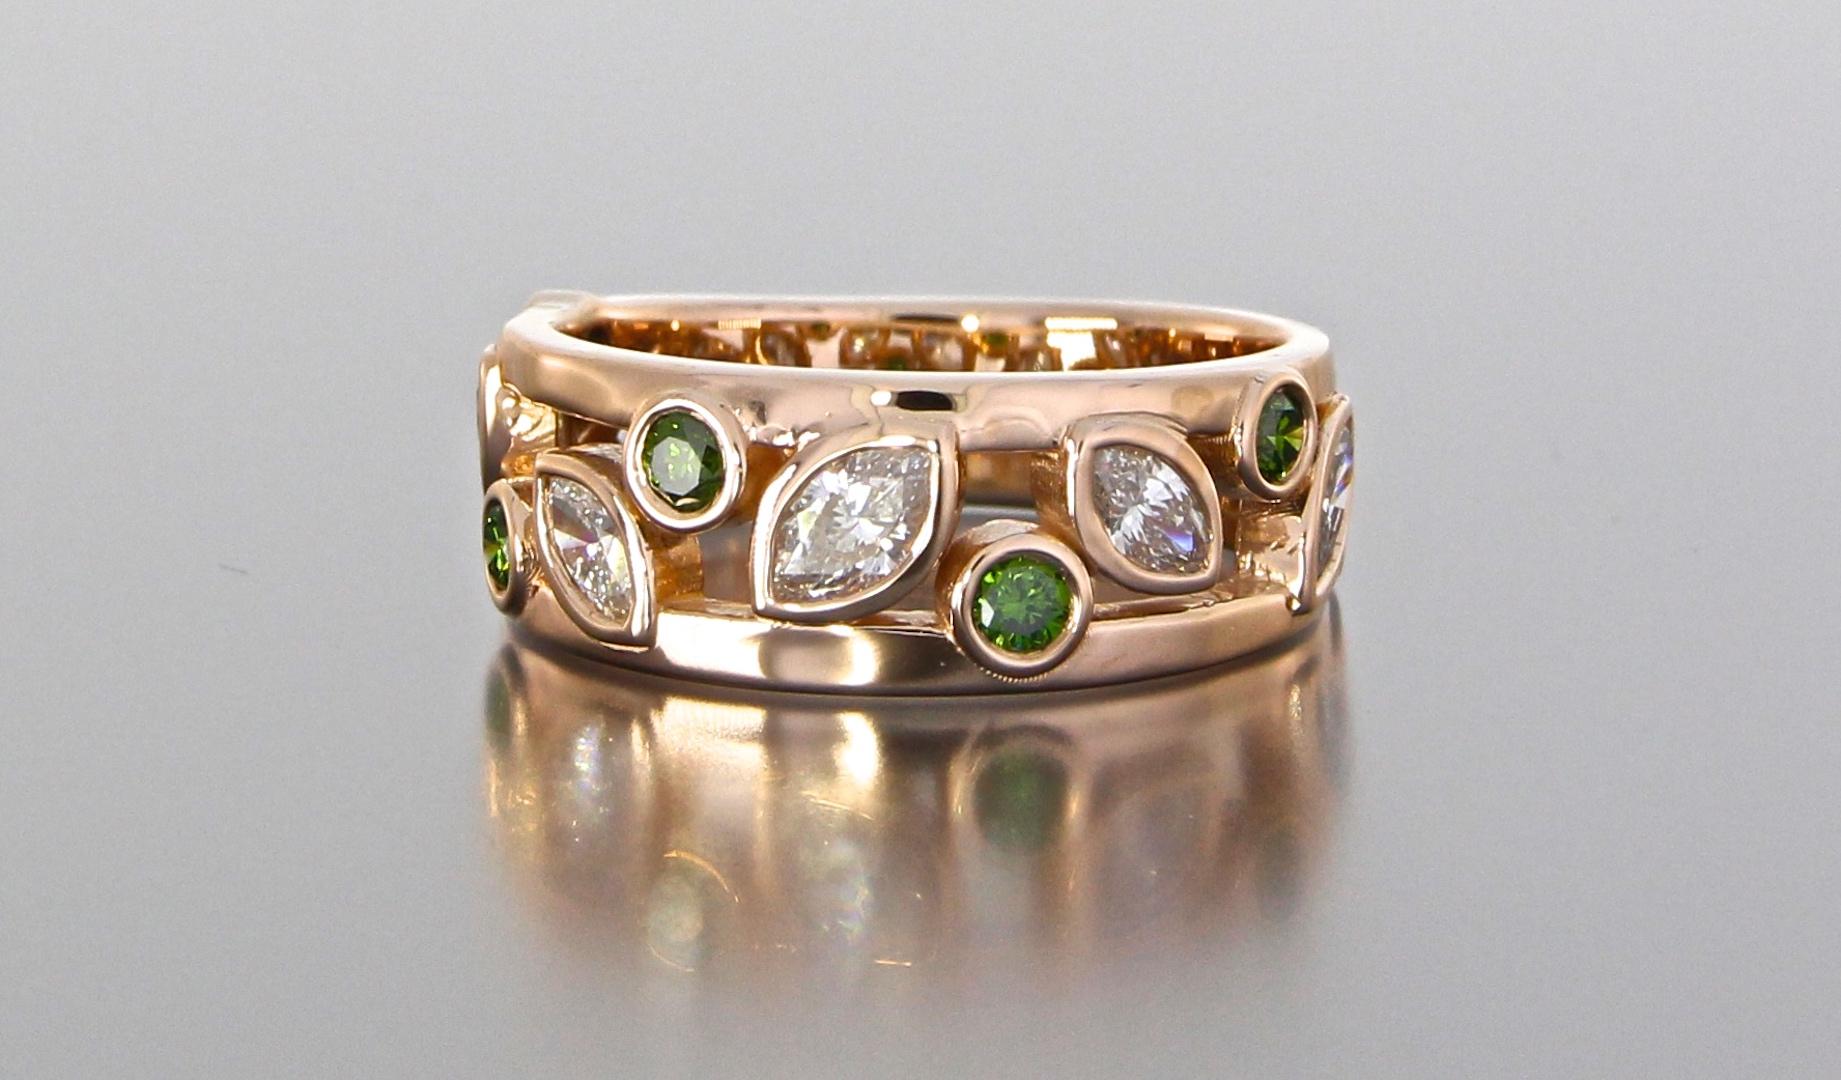 unique-white-diamond-green-stone-rose-gold-wedding-anneversary-band-ladies-custom-jewelry-store-grand-rapids